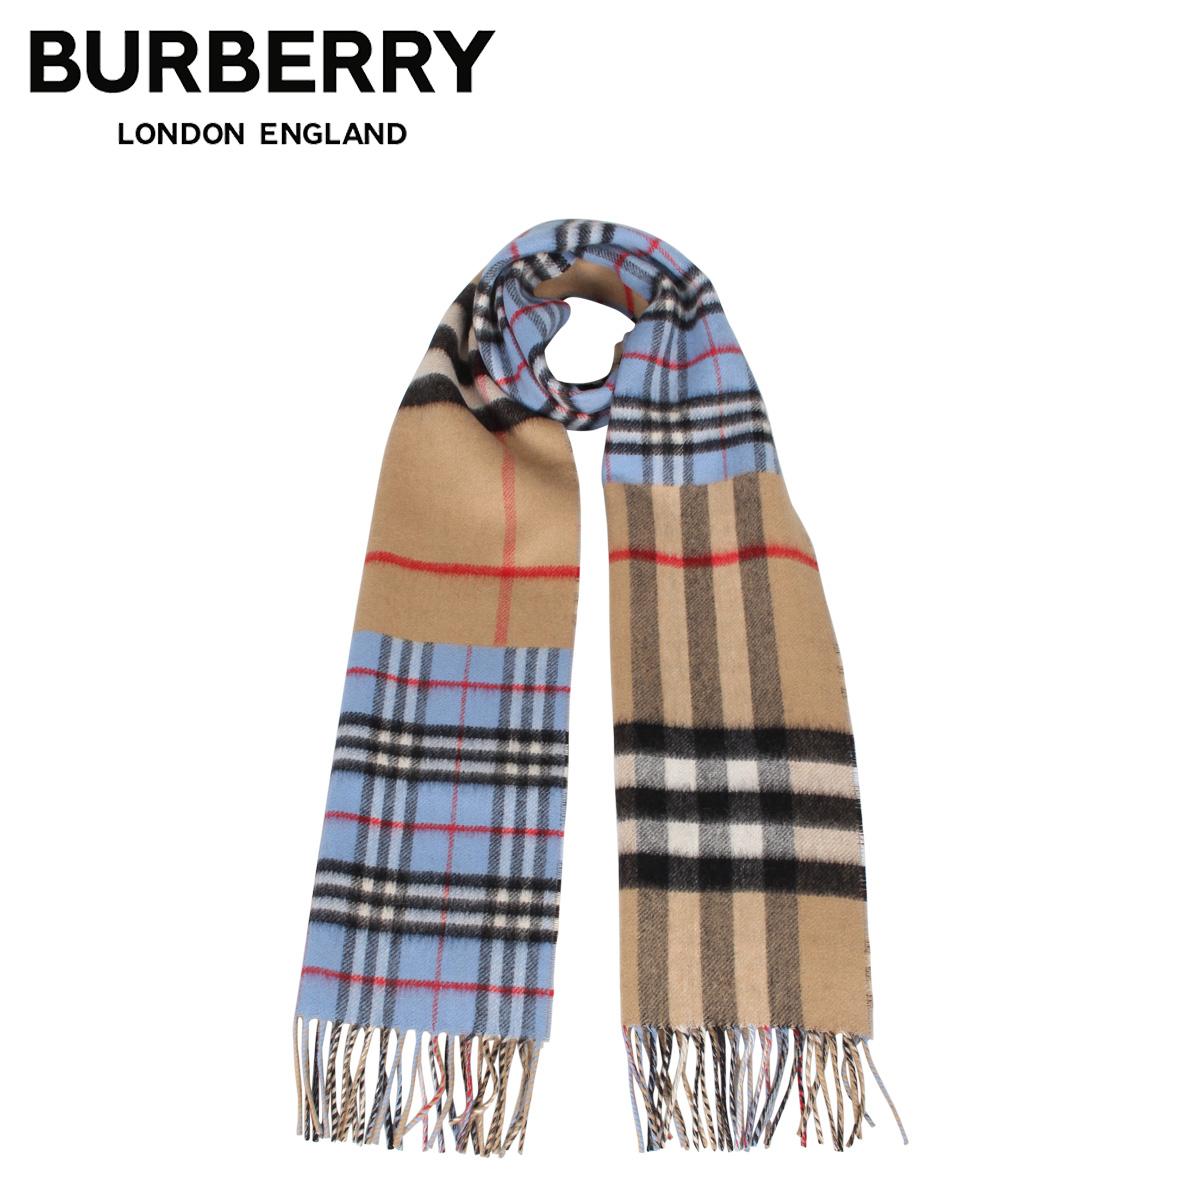 BURBERRY バーバリー マフラー スカーフ メンズ レディース チェック カシミア MUFFLER ブルー 8022478